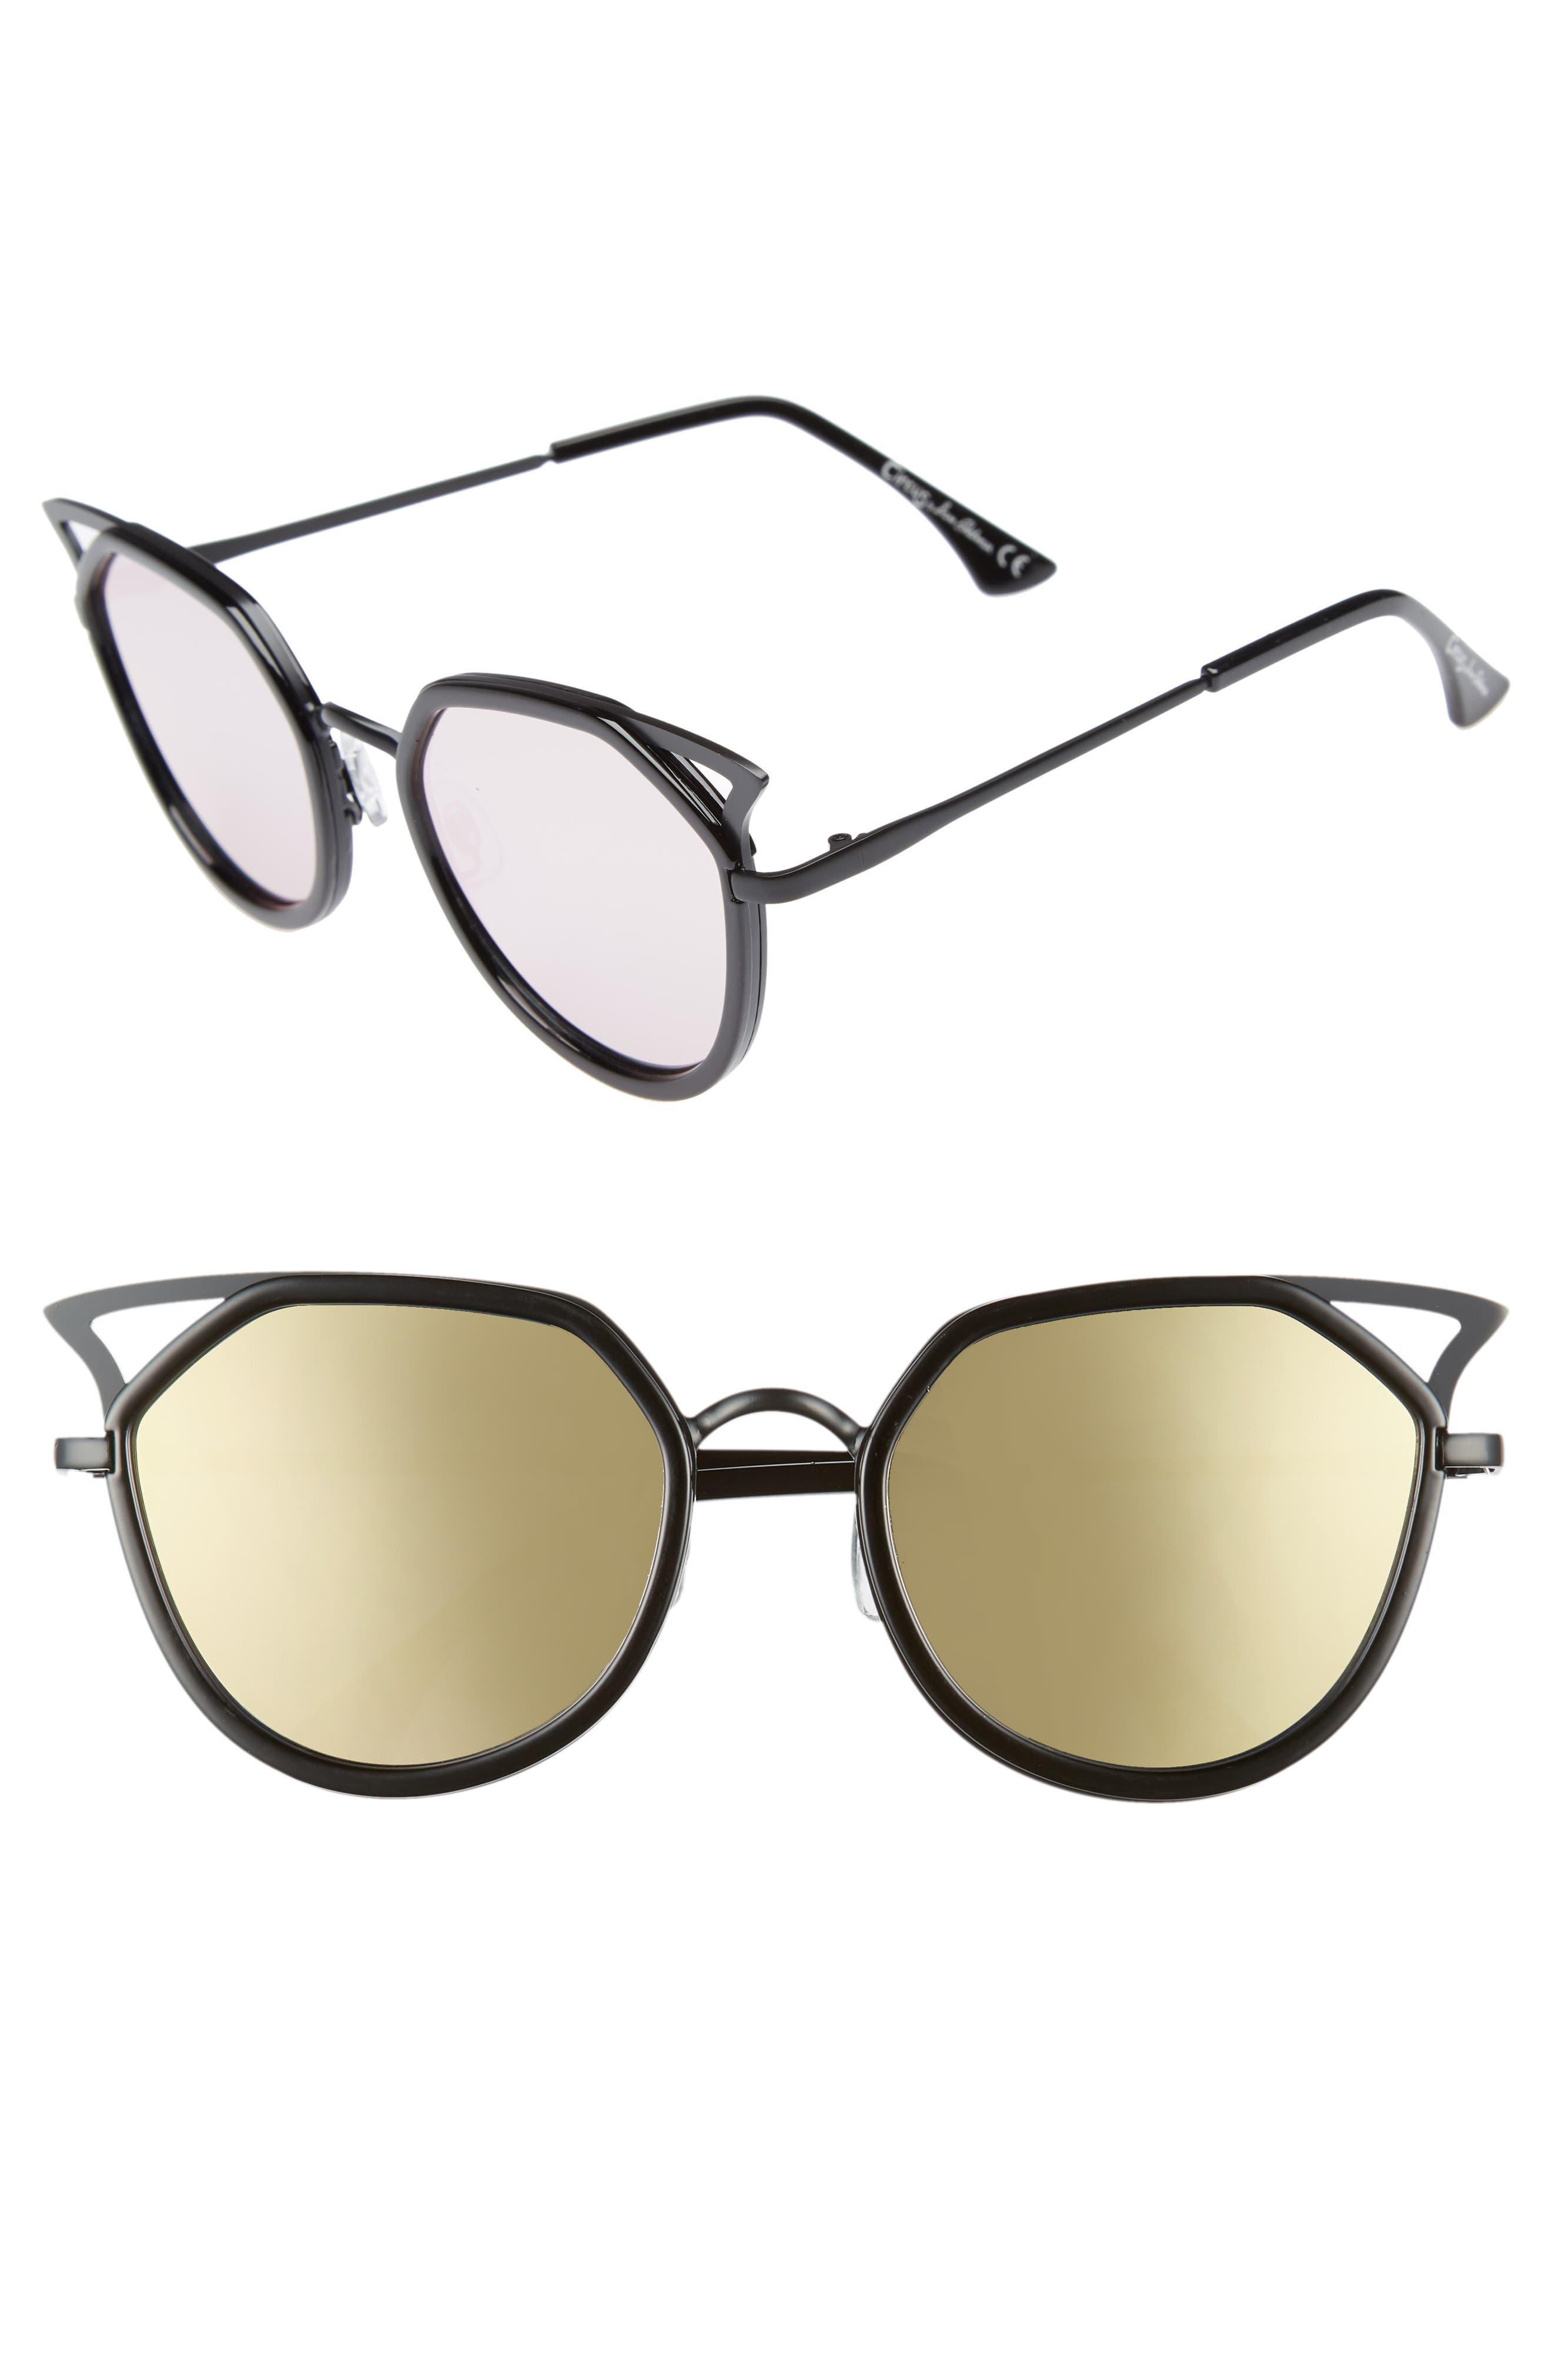 Satellite 60mm Cat Eye Sunglasses,                         Main,                         color, Black